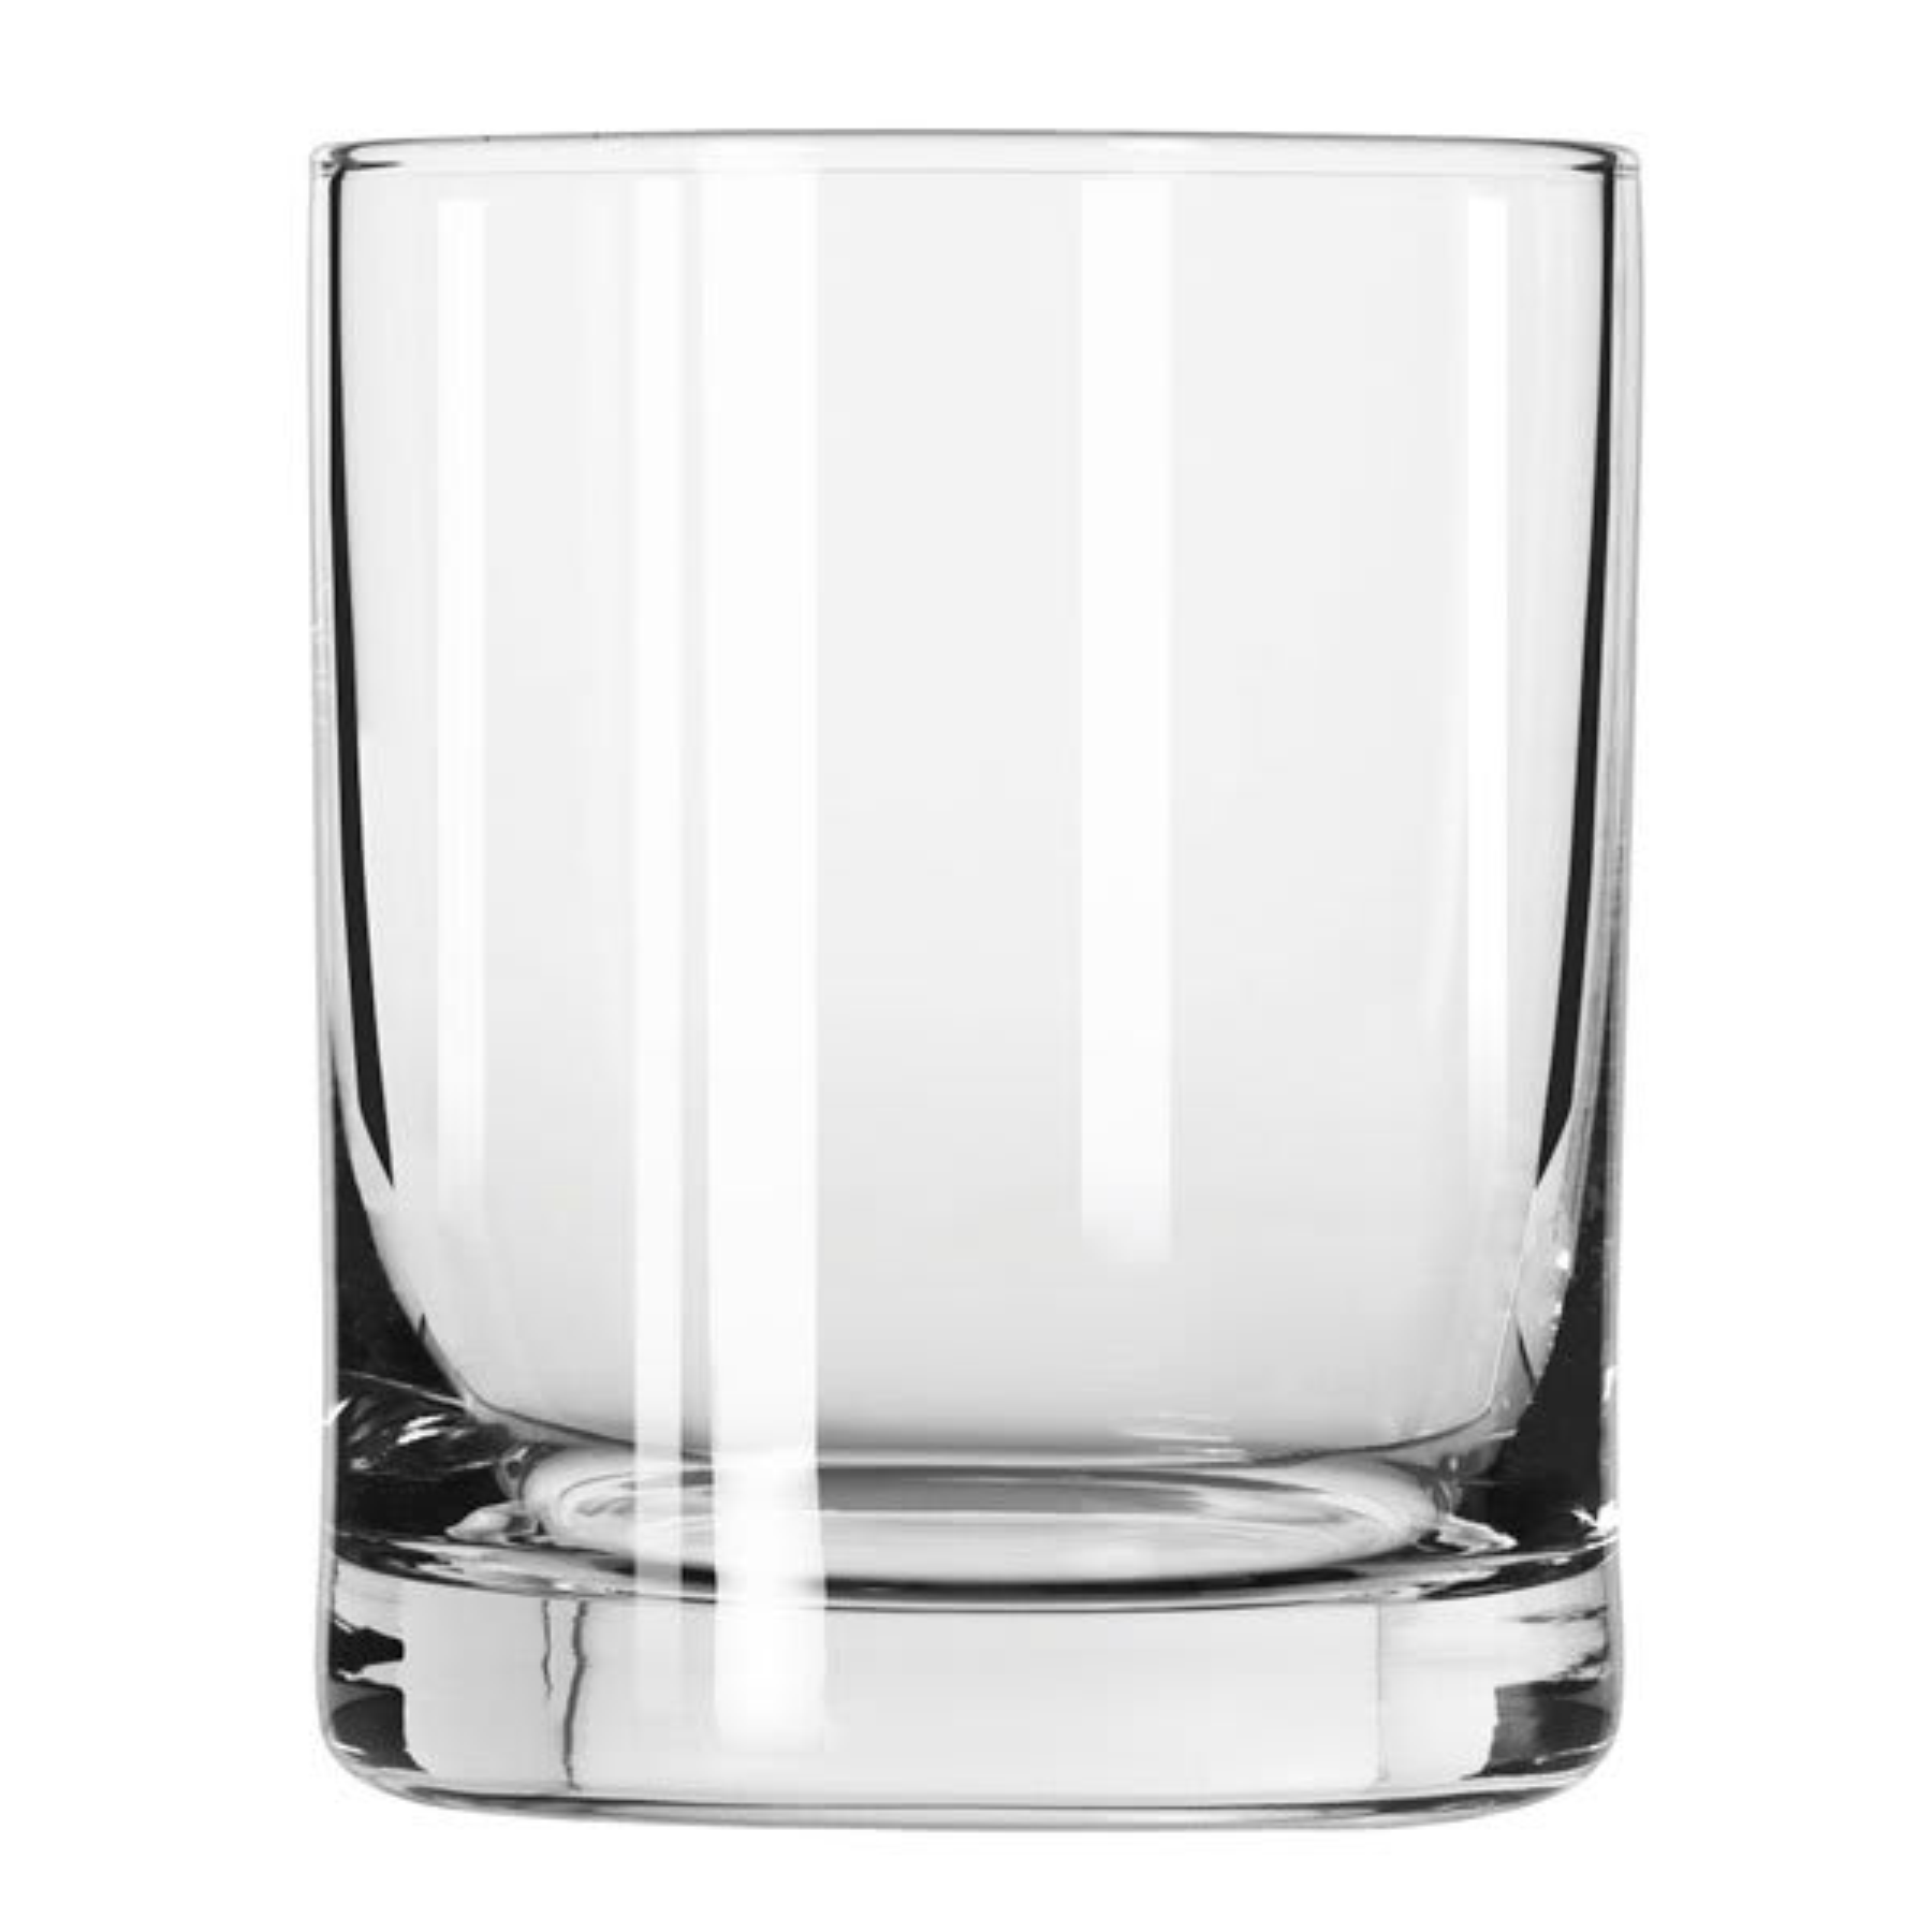 Libbey 2328 7.75-oz Old Fashioned Glass - Lexington